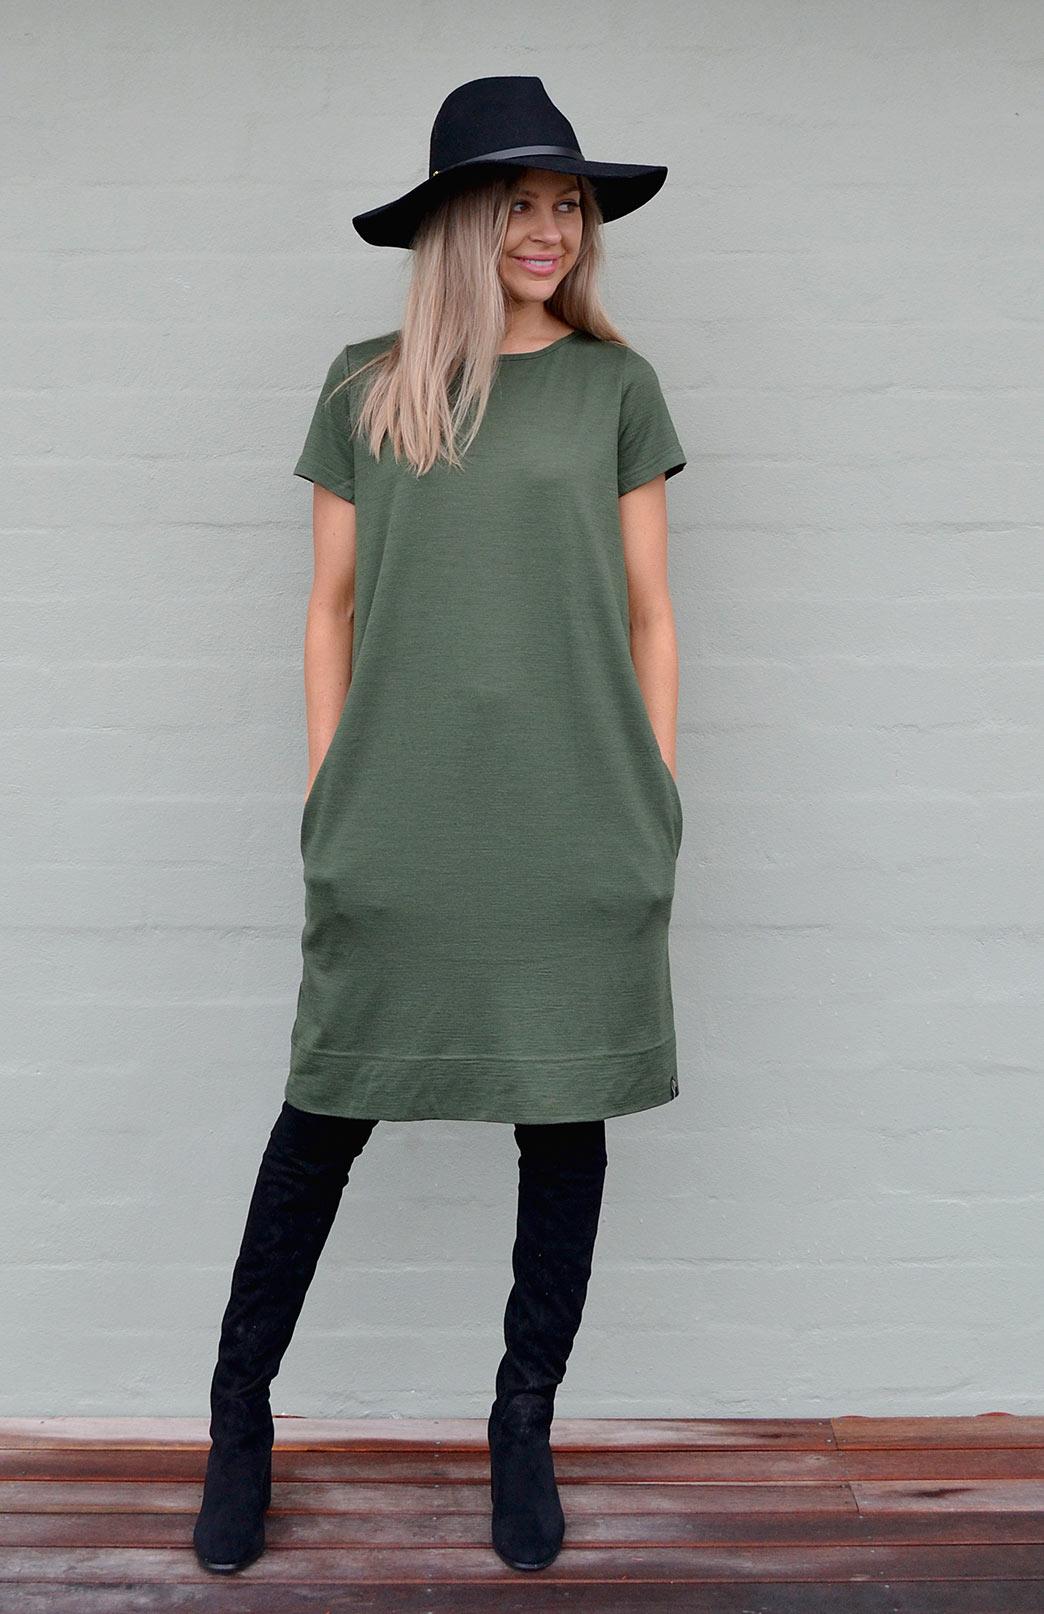 8522-tiffany-dress-kale-1.jpg